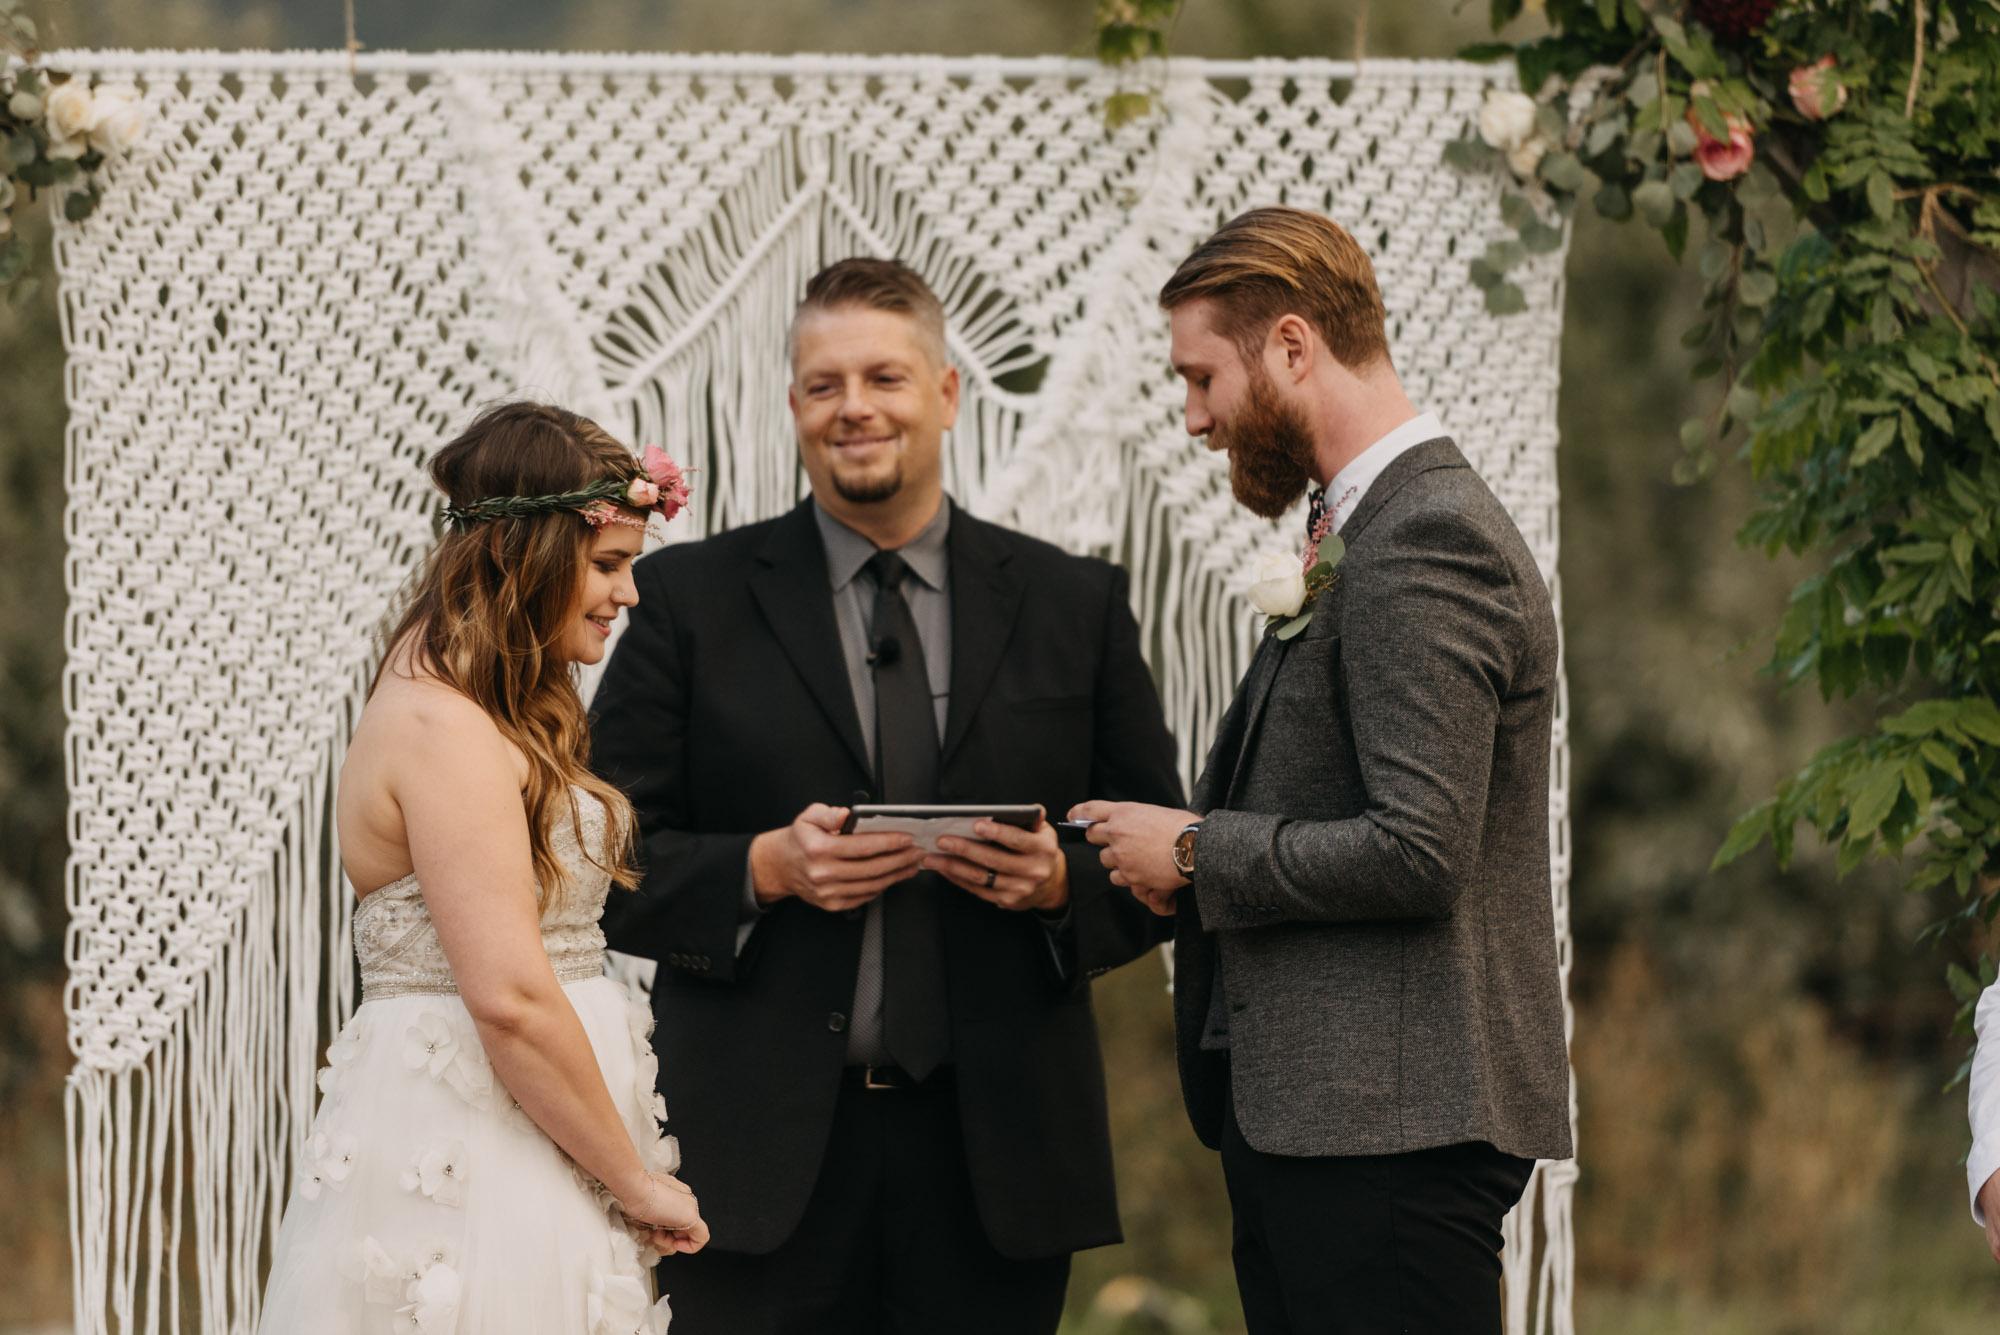 Outdoor-Summer-Ceremony-Washington-Wedding-Rainbow-9045.jpg